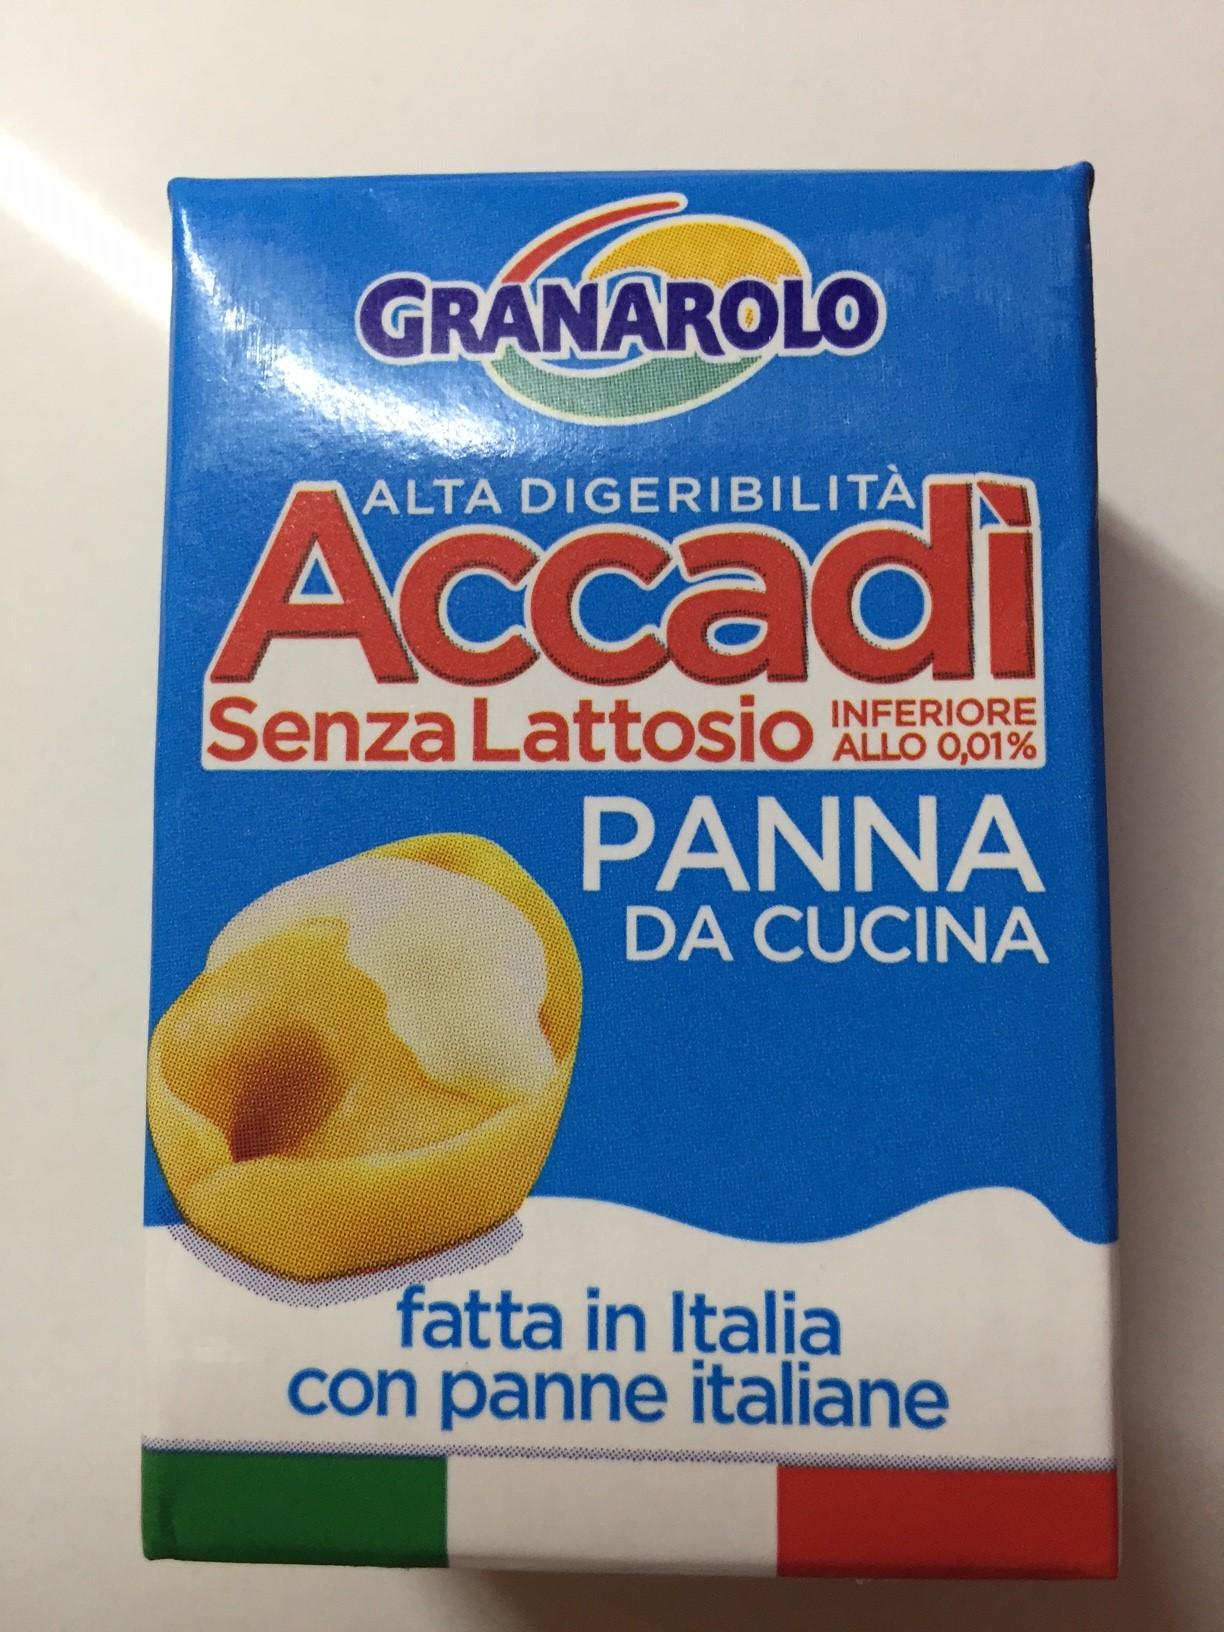 Panna da cucina Accadì - lattosio <0,01 Image